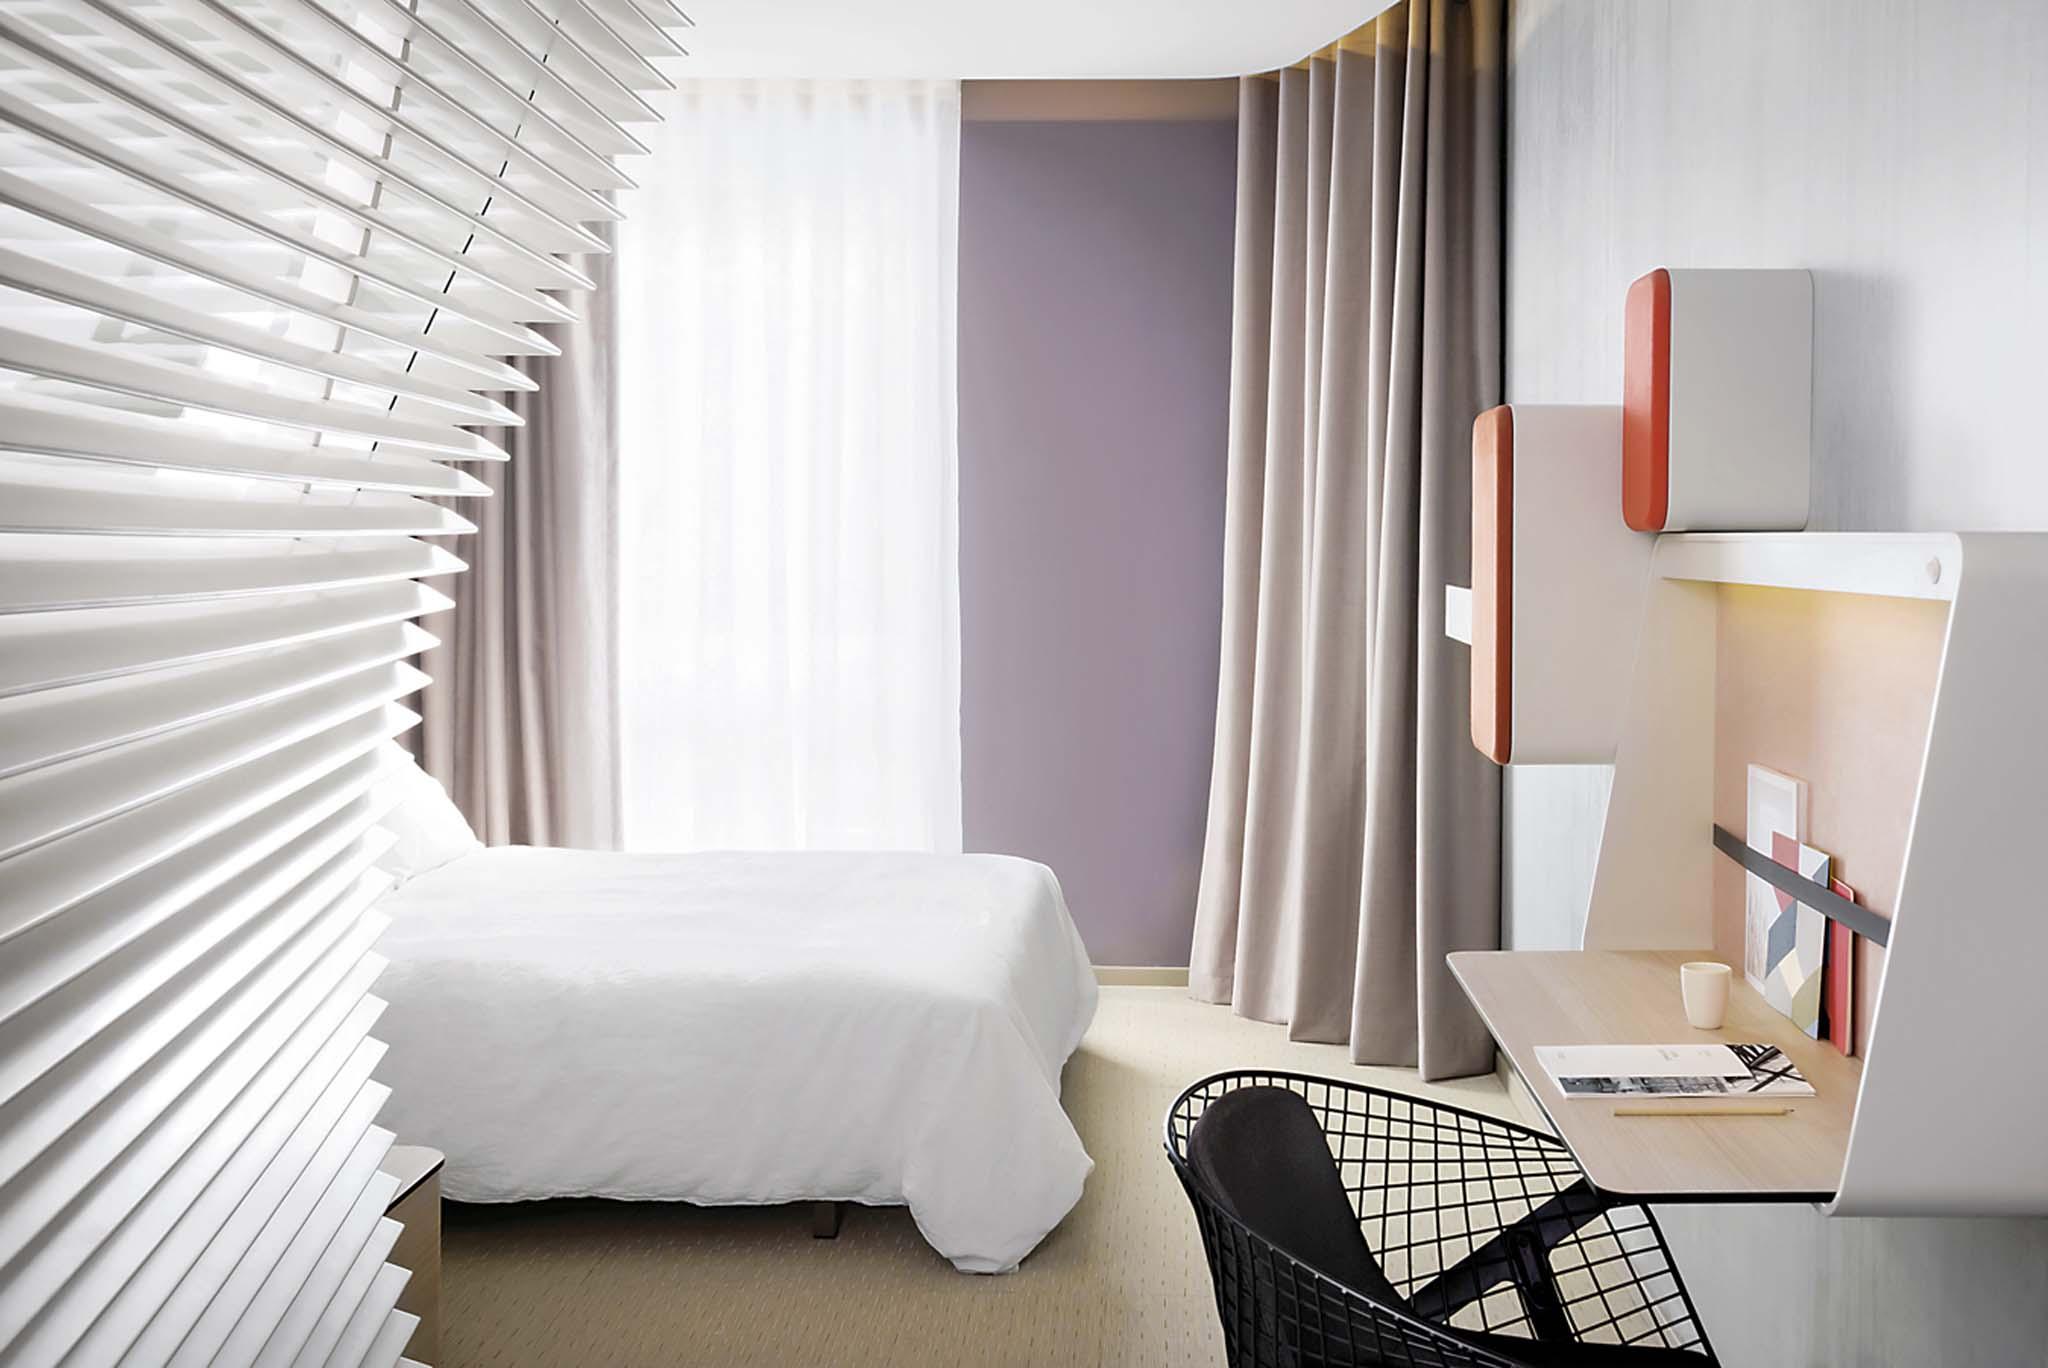 Studio norguet design okko h tel for Hotel design nantes